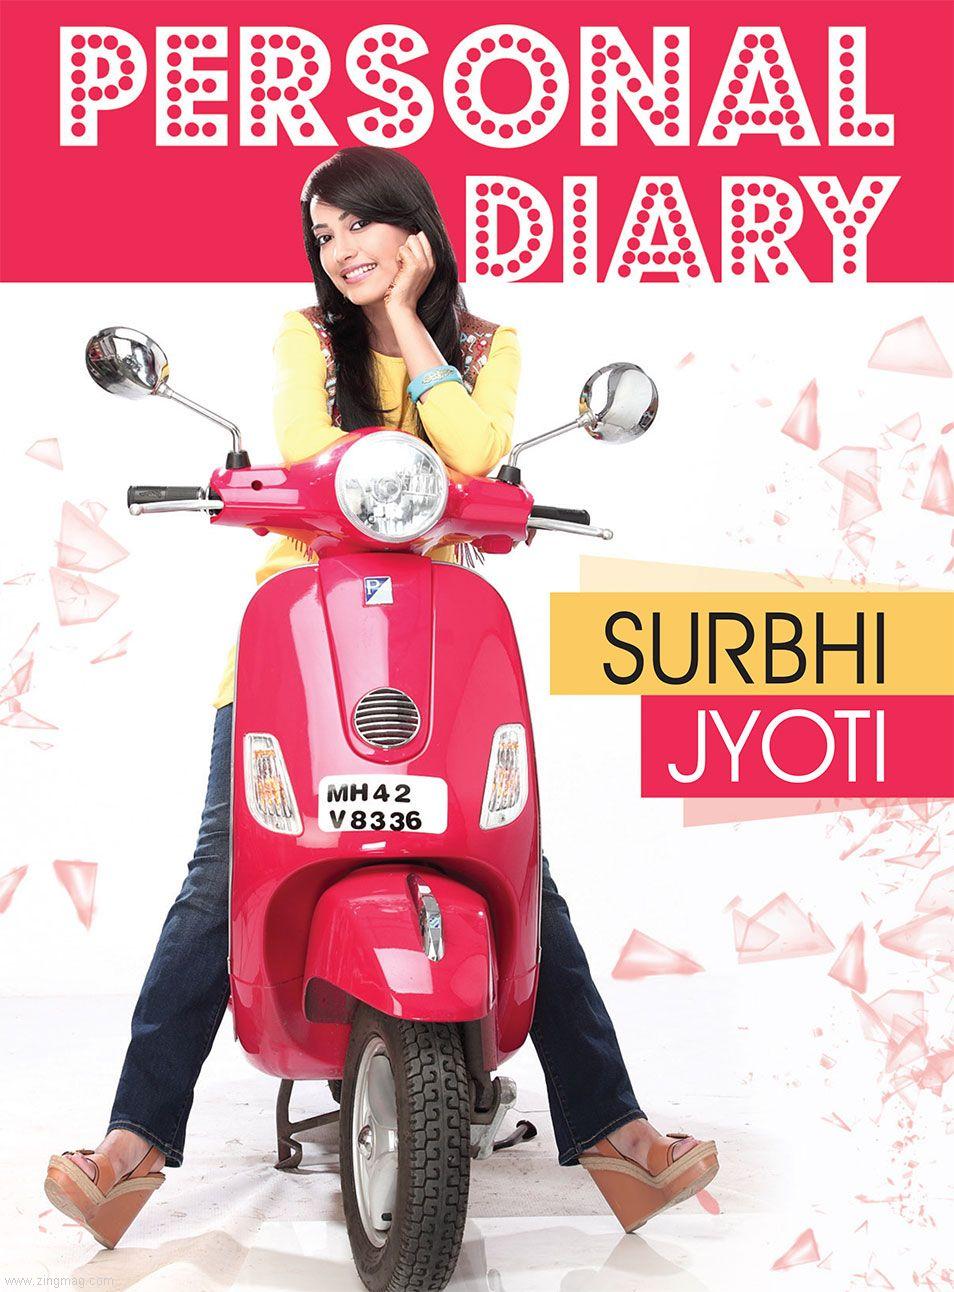 Persoanl Dairy Of Surbhi Jyoti